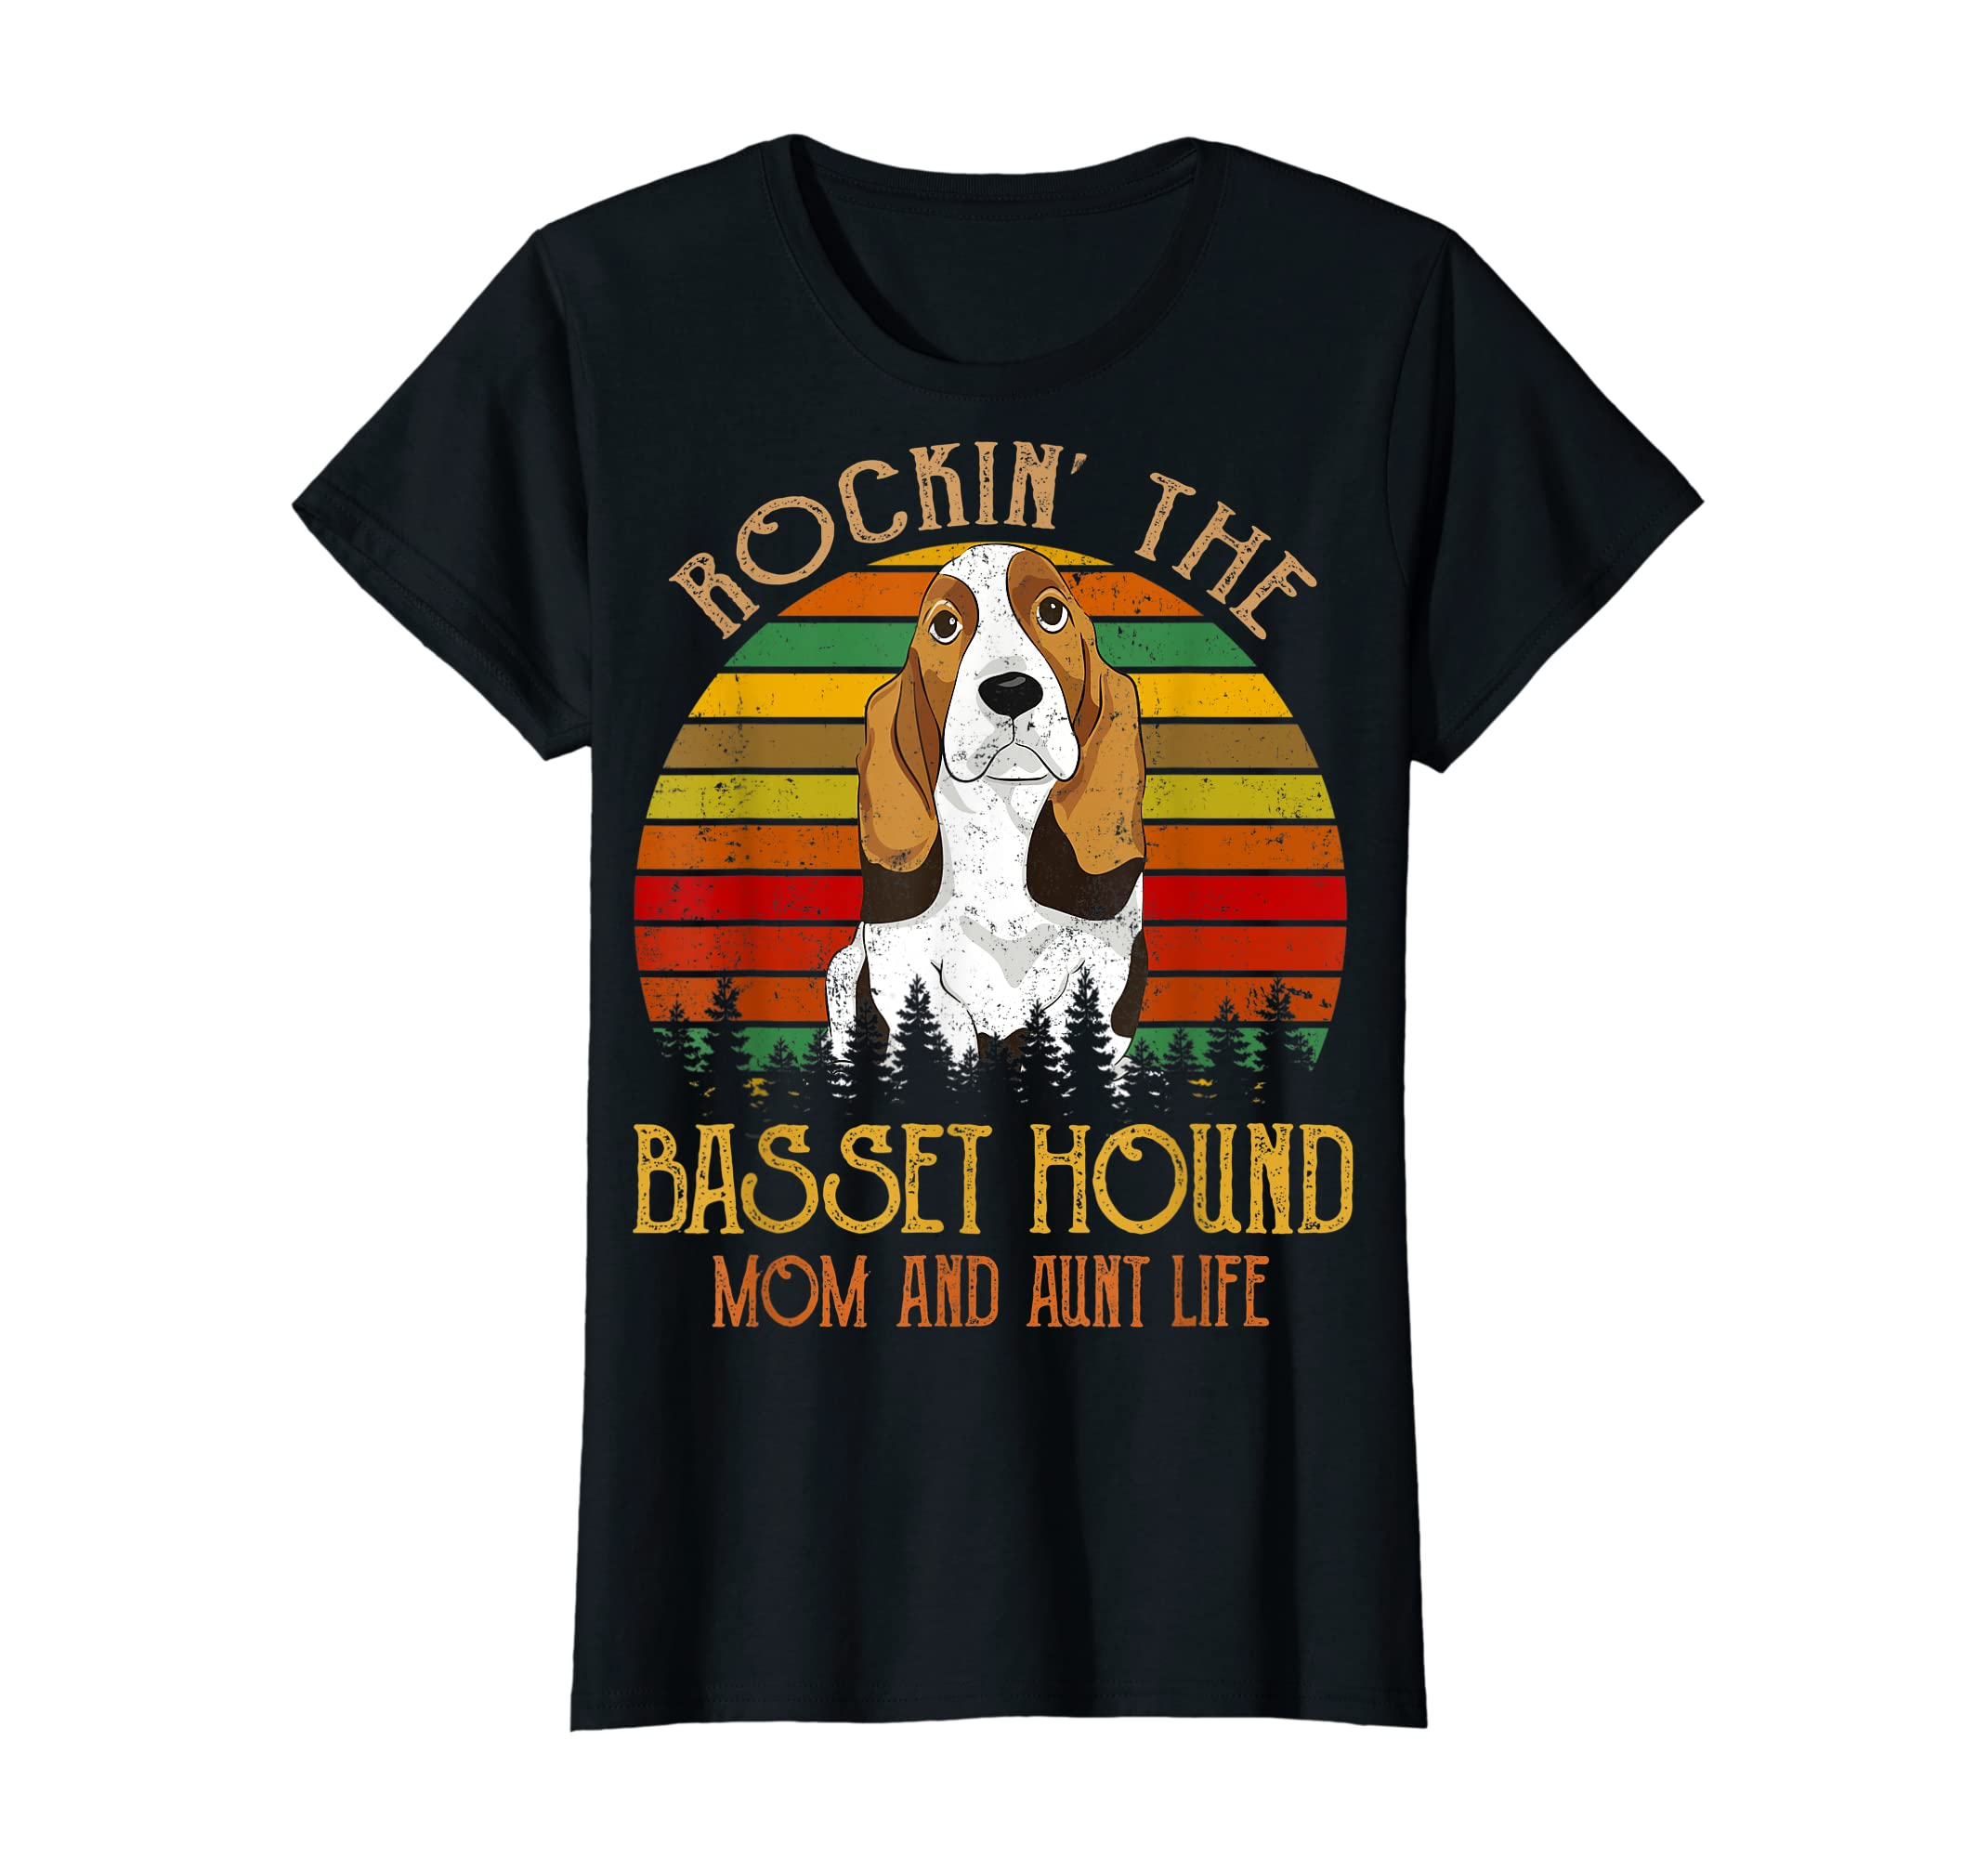 Rockin' The Basset Hound Mom Aunt Life T-Shirt For Women T-Shirt-Women's T-Shirt-Black